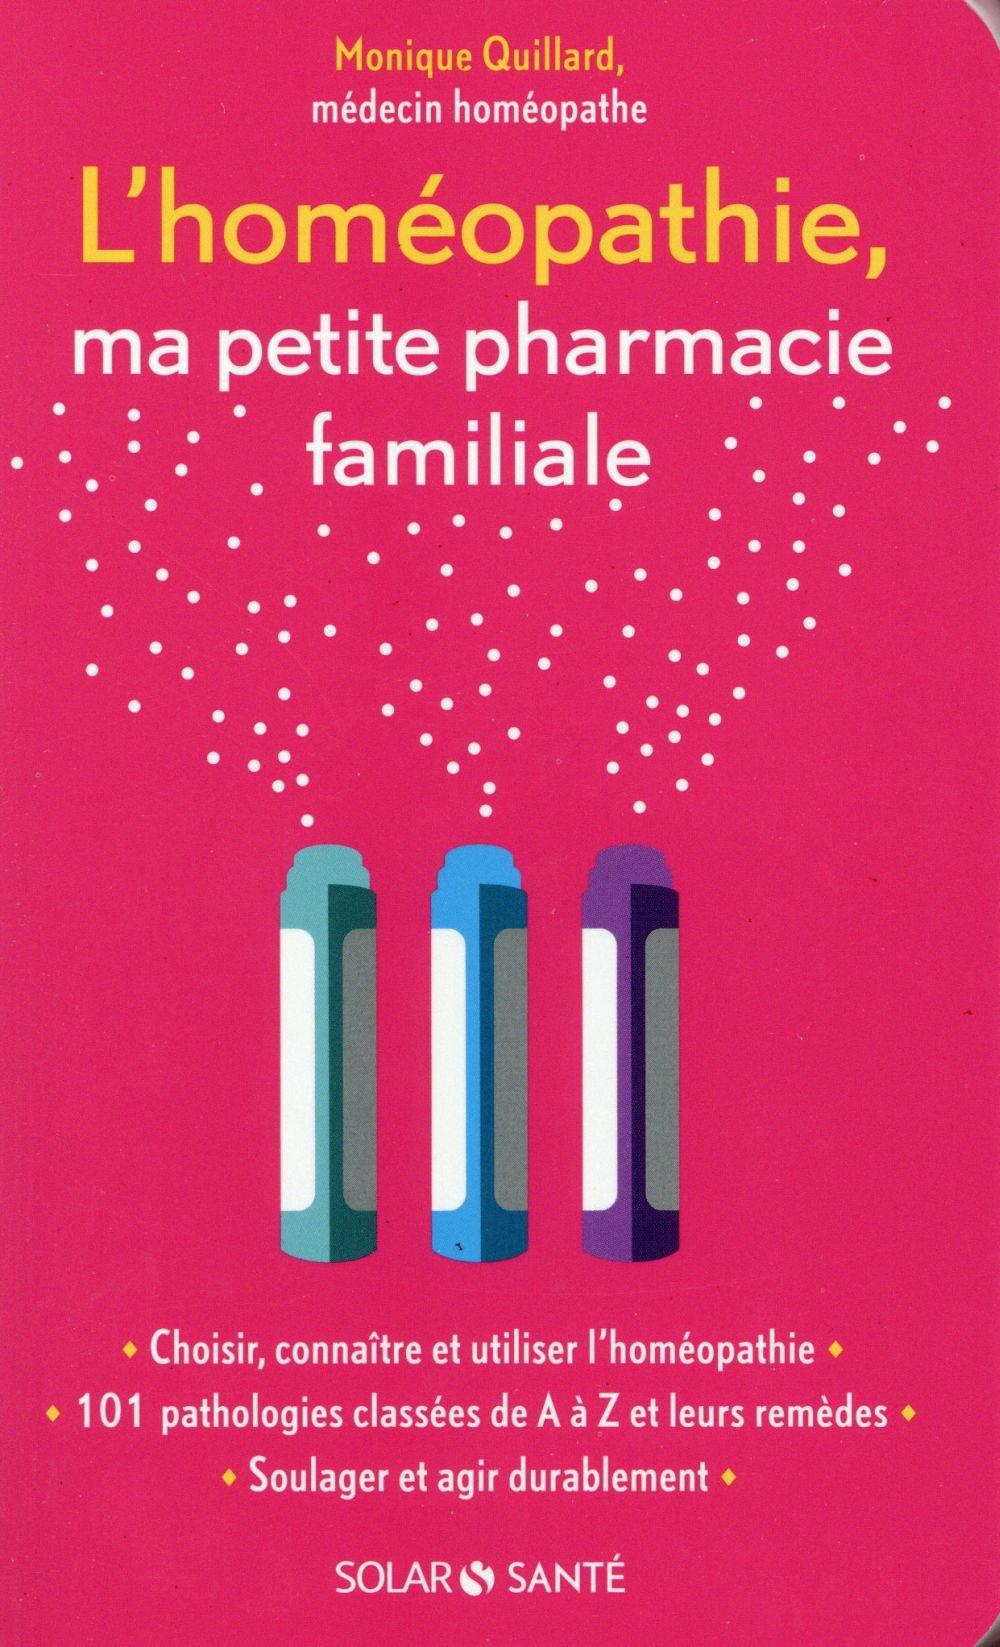 L'homéopathie ; ma petite pharmacie familiale